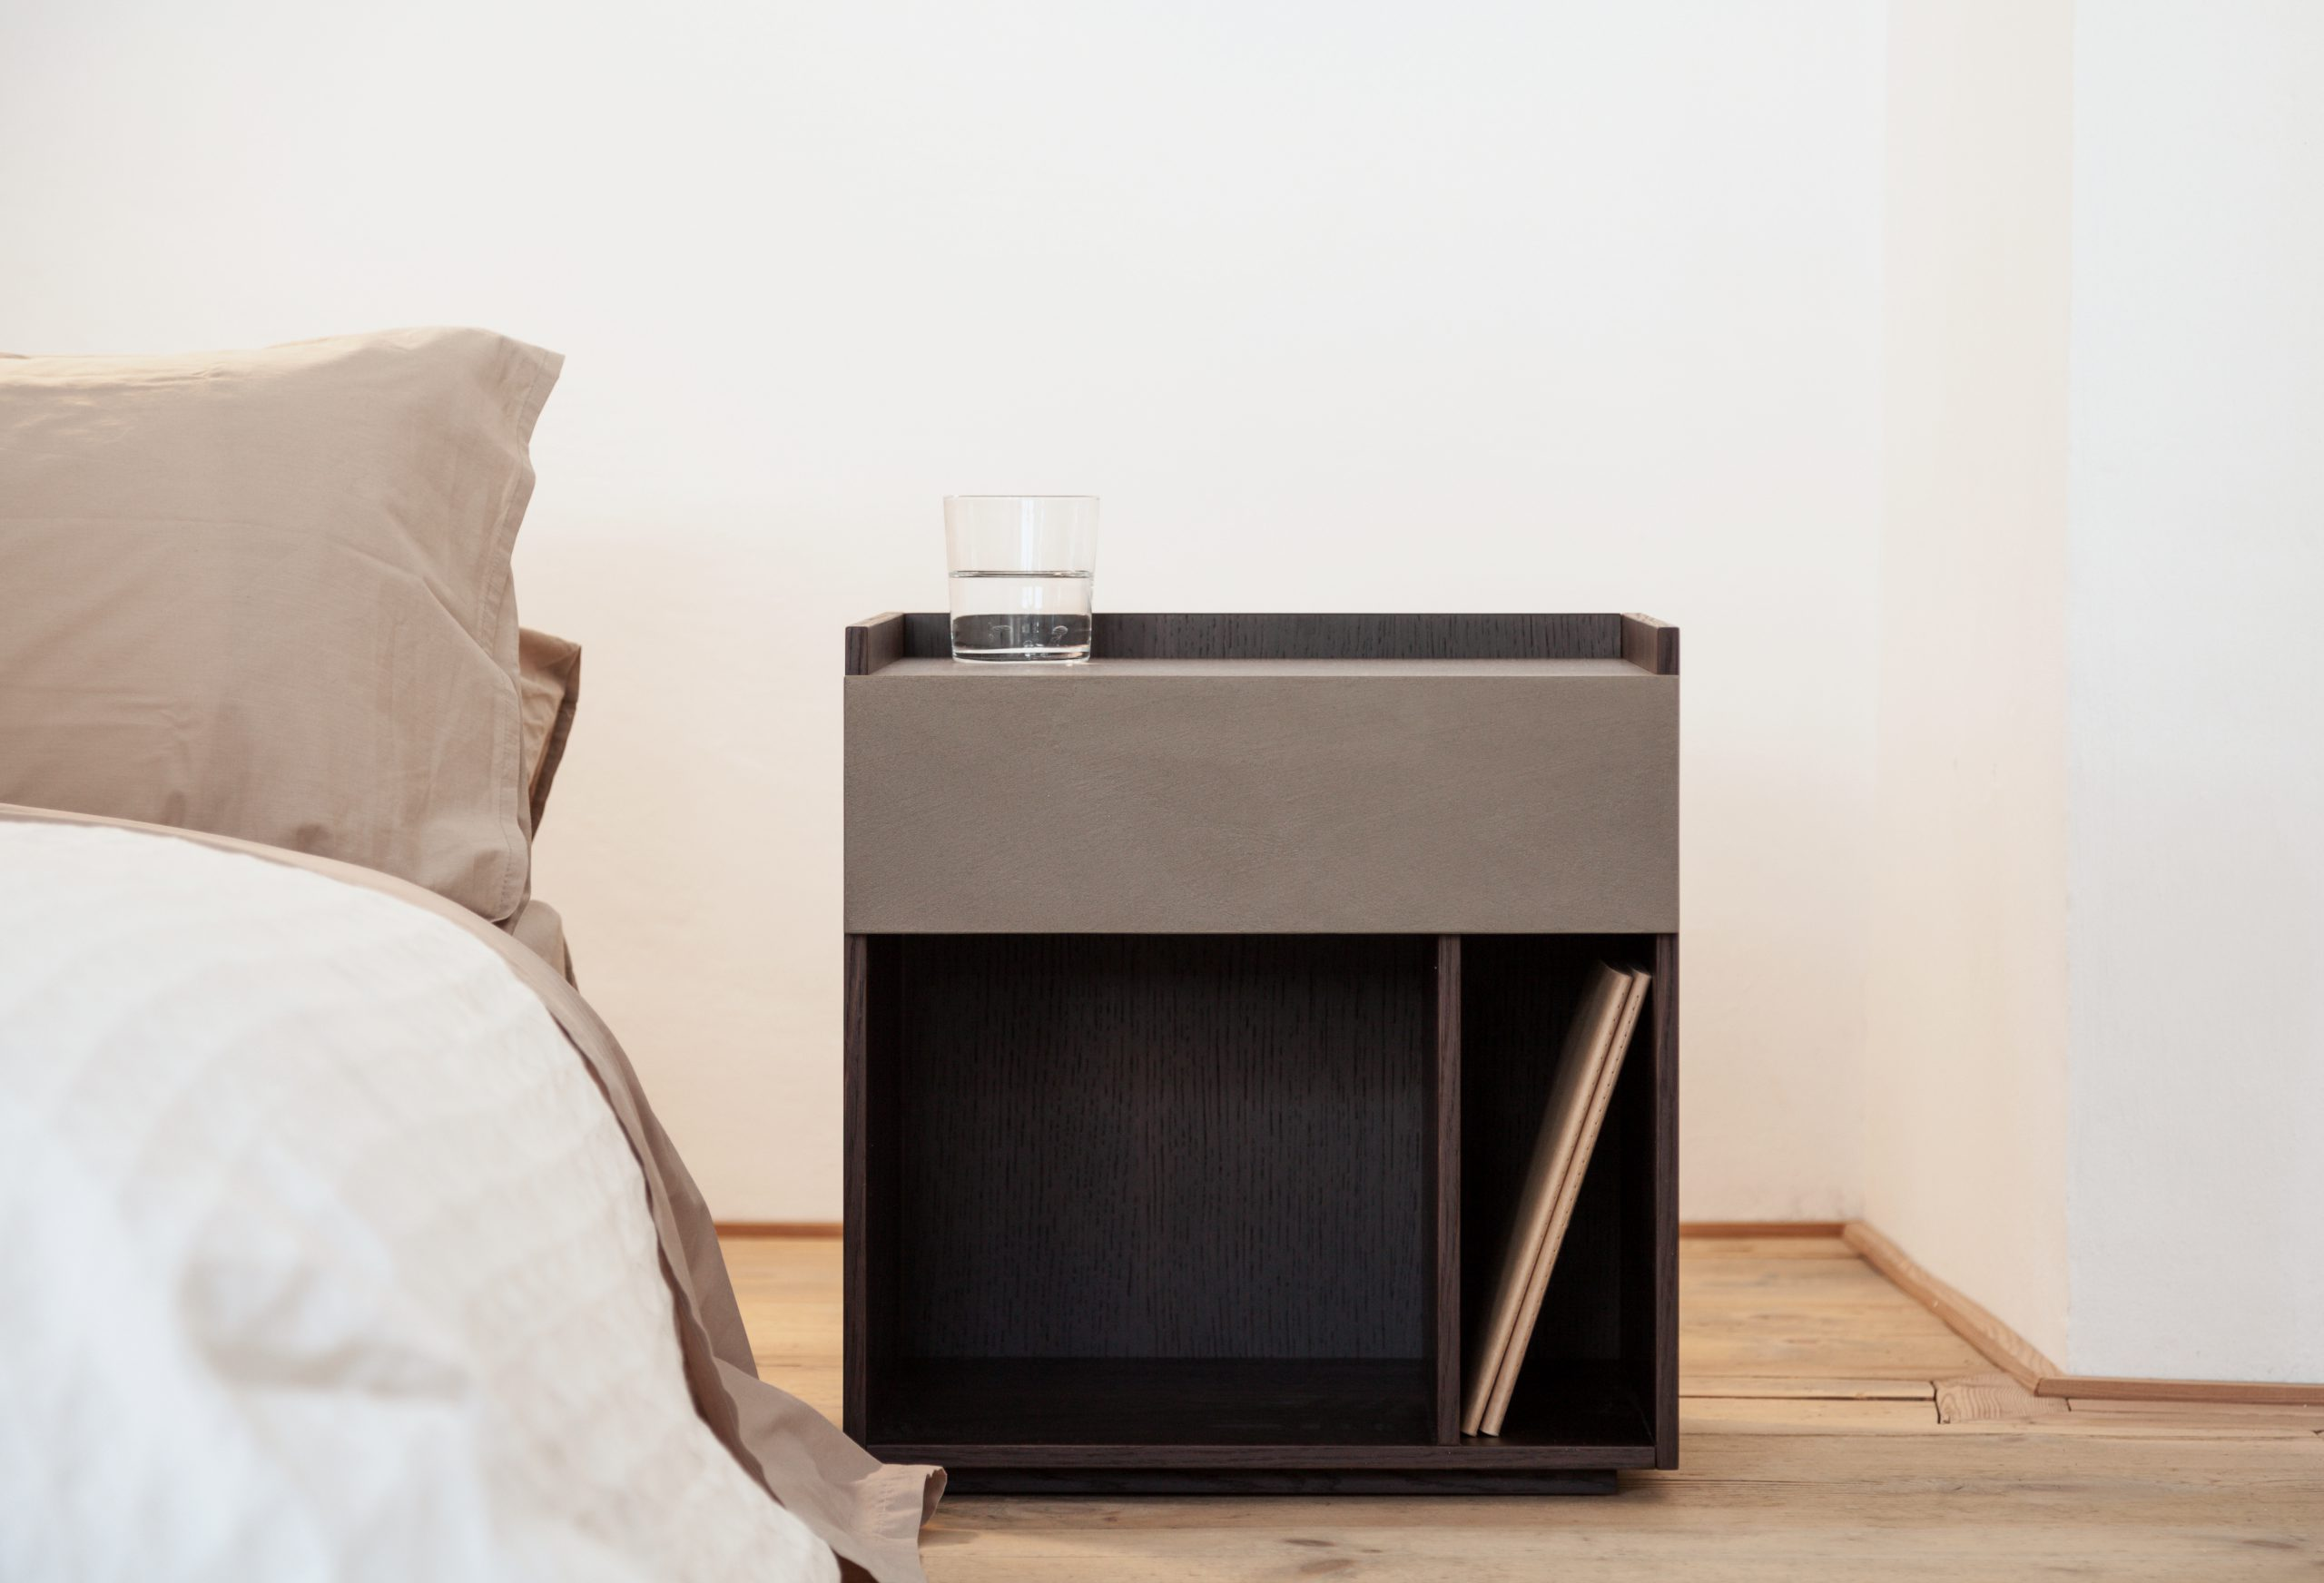 Tip drawer units by Debiasi Sandri for Lema